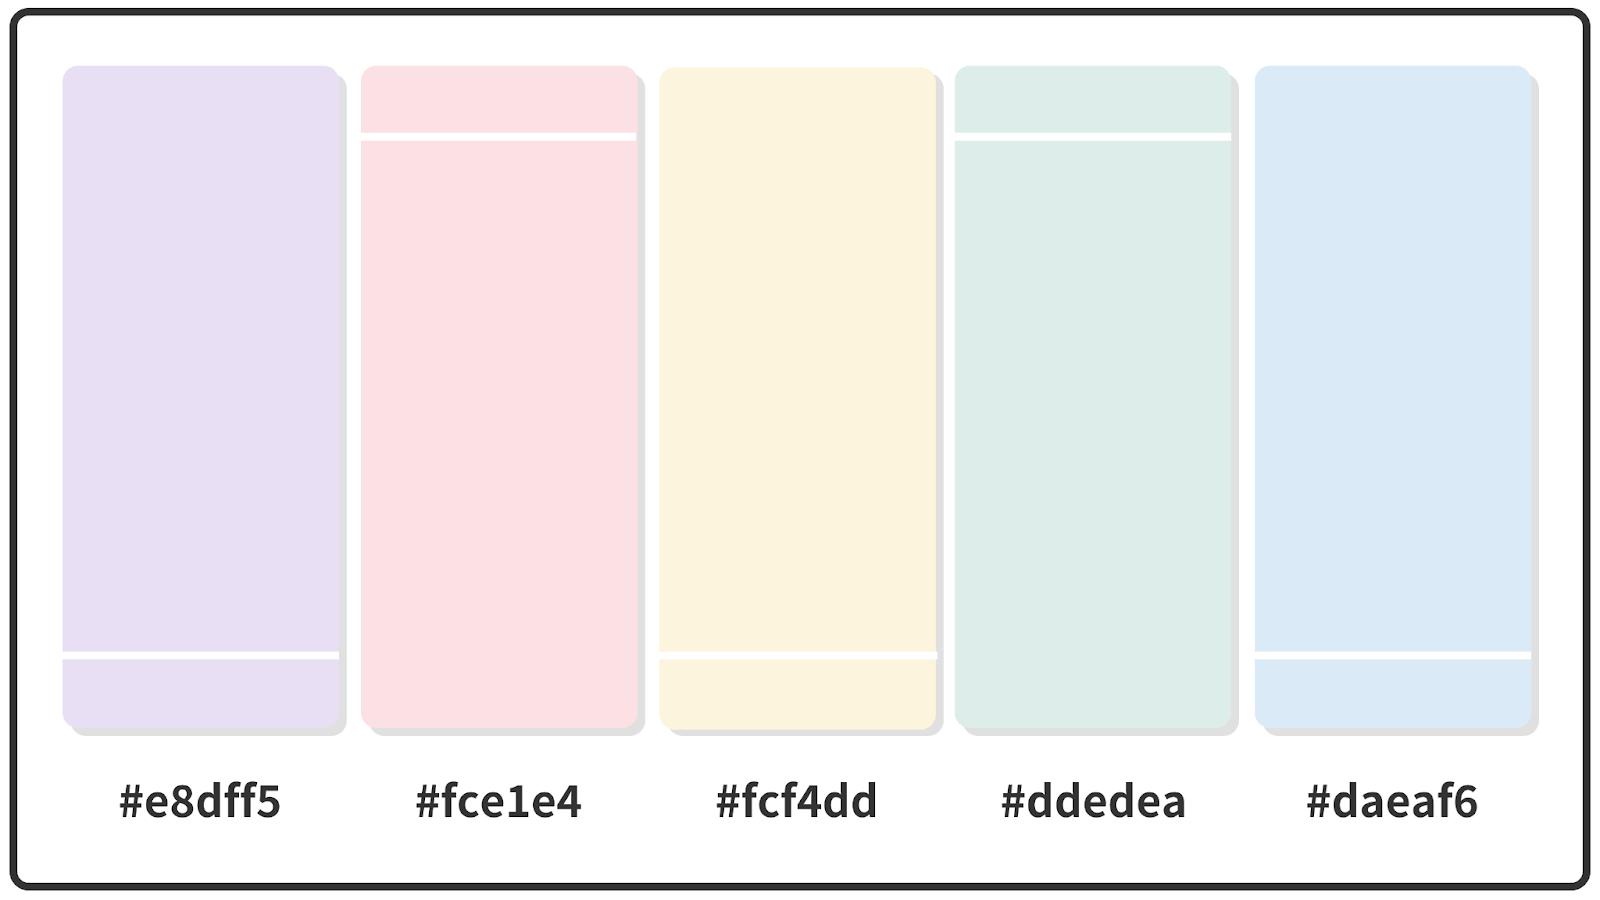 Cornsilk + Pale Pink + Alice Blue Paste Color Palette